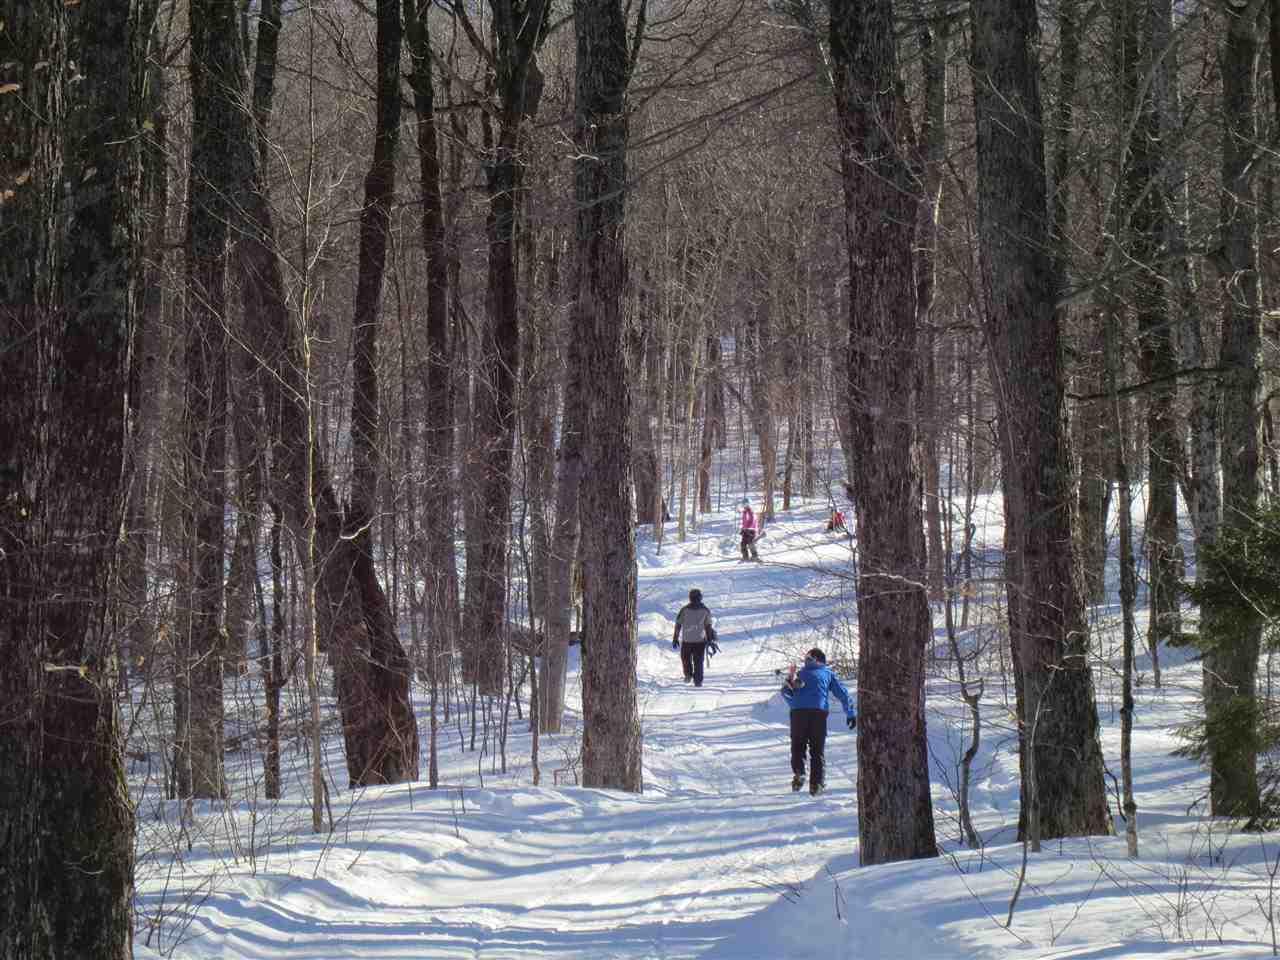 Mount-Snow-Real-Estate-4615709-13